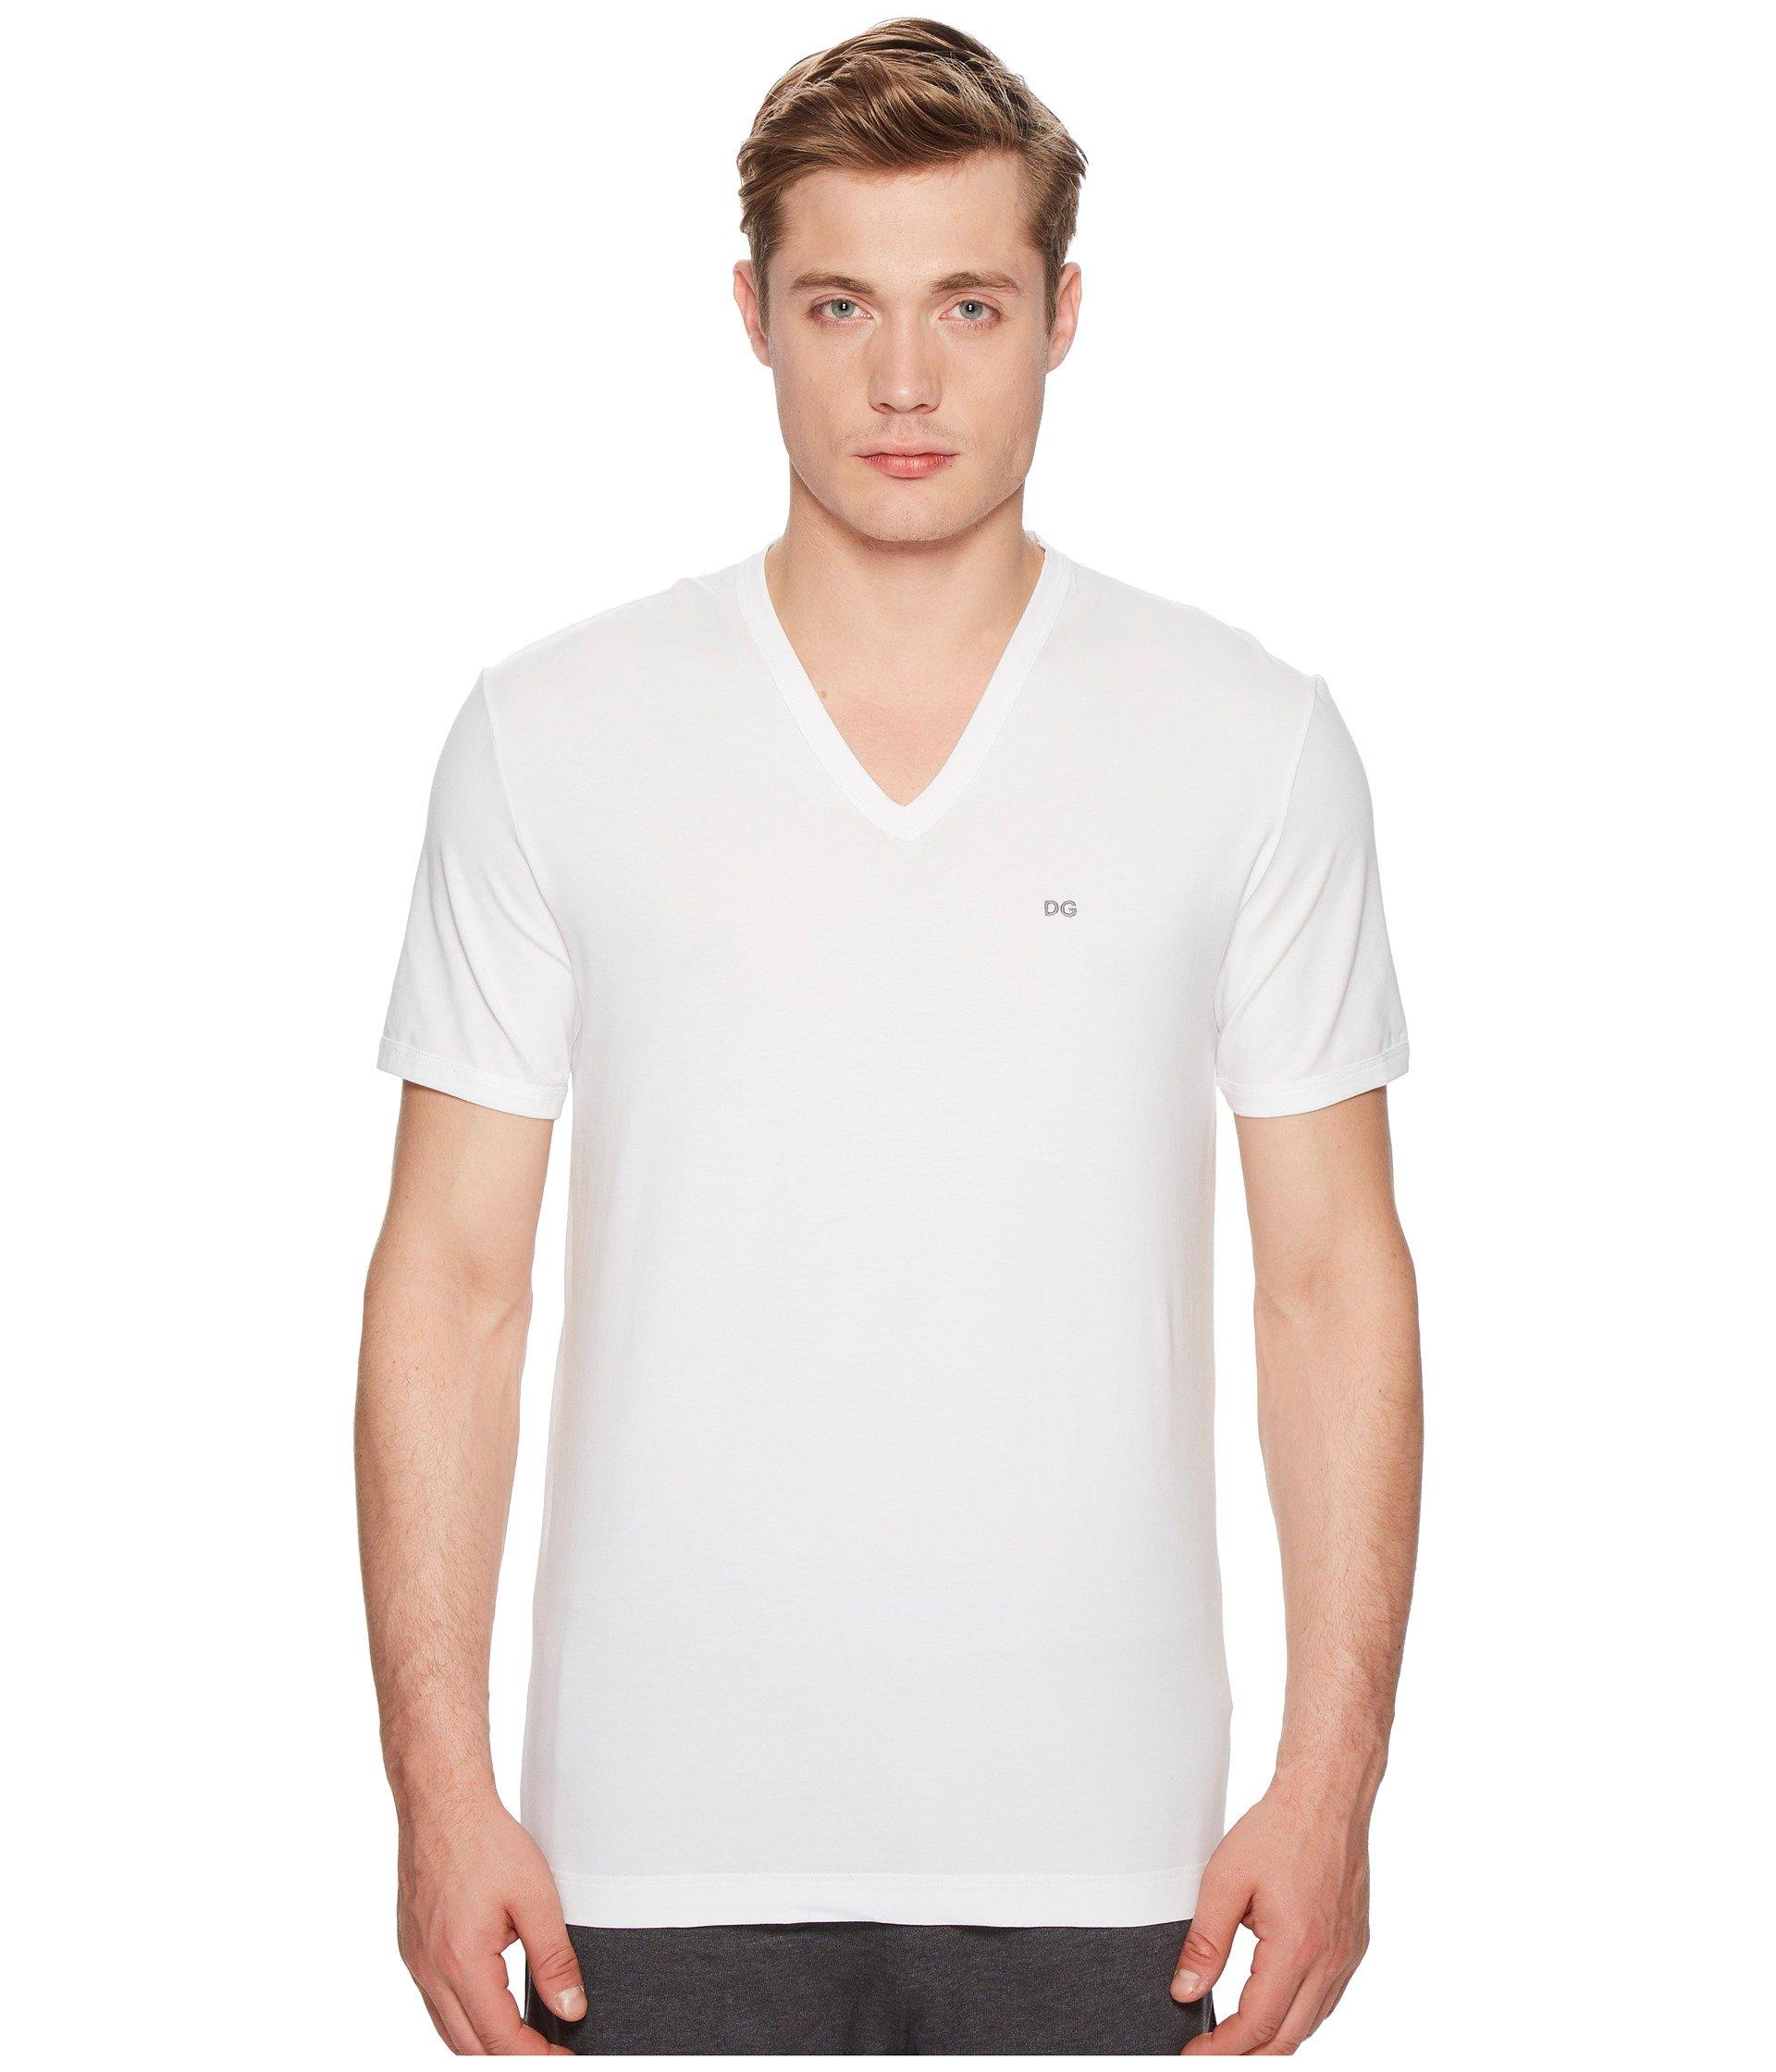 Camiseta para Hombre Dolce andamp; Gabbana Stretch Cotton V-Neck T-Shirt  + Dolce & Gabbana en VeoyCompro.net